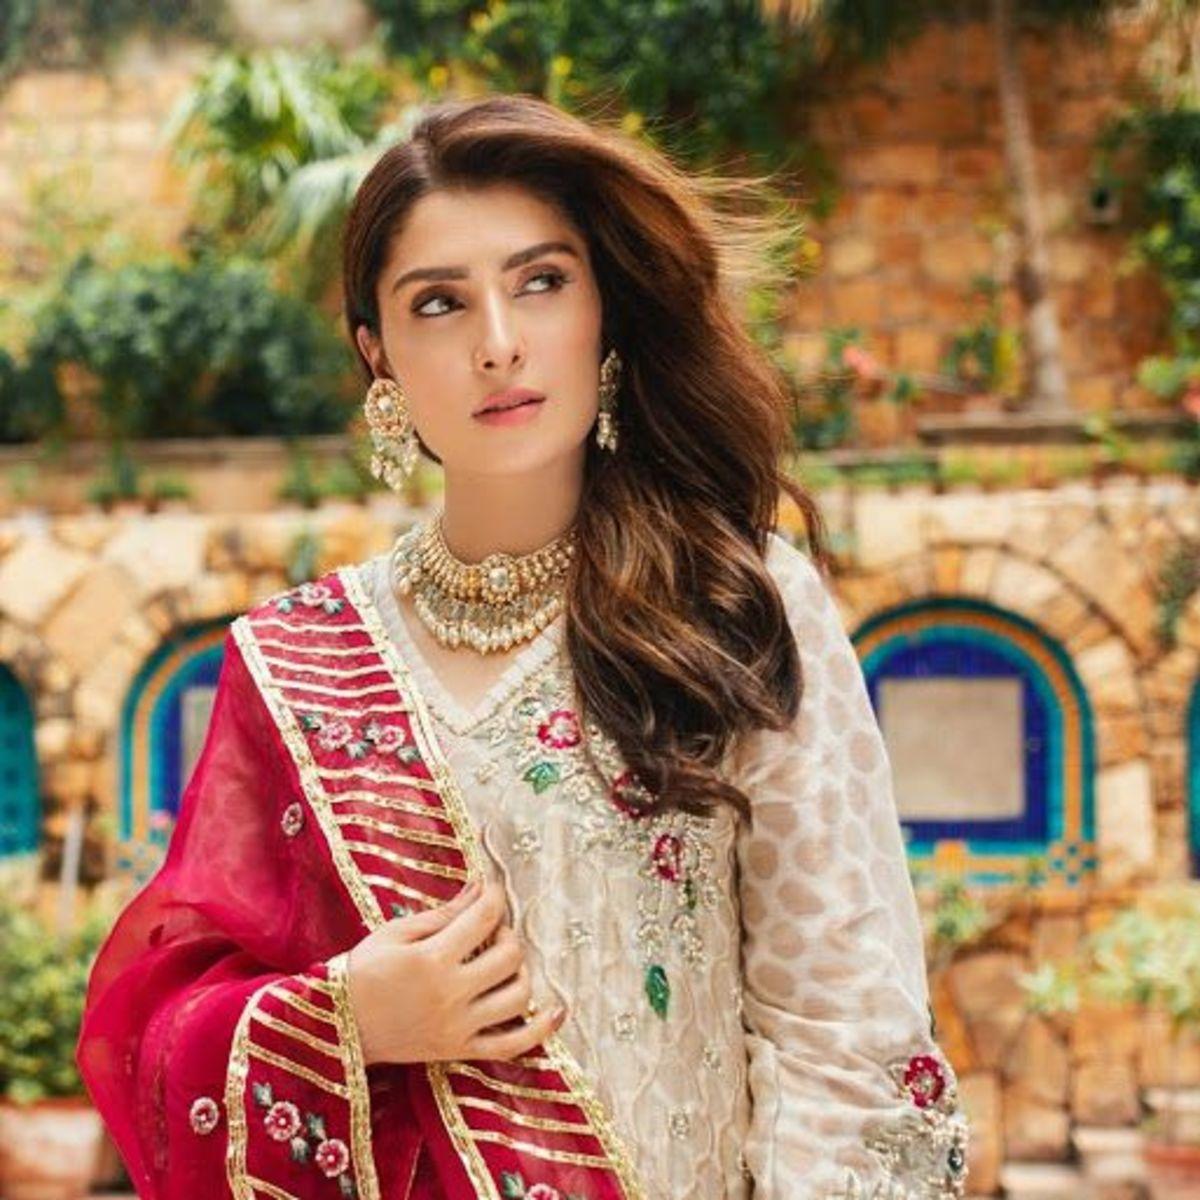 2021 Pakistan's 15 Most Popular Female Fashion Models